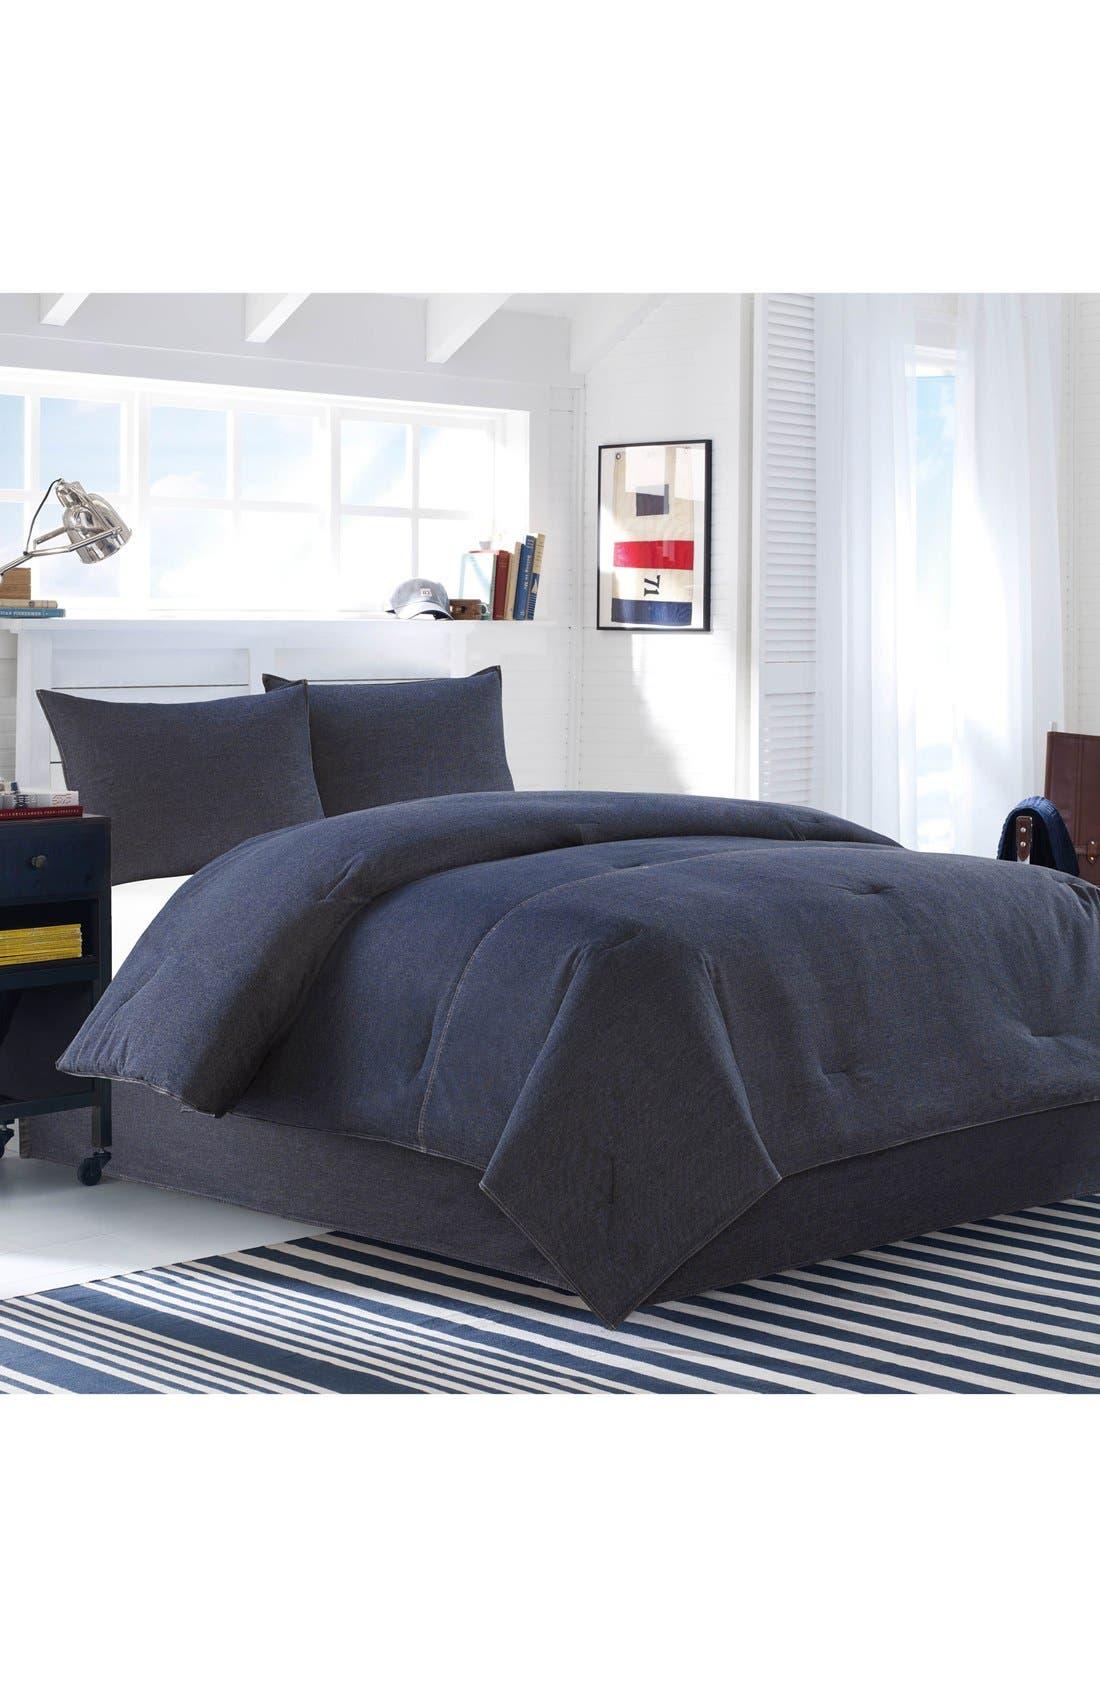 NauticaSeaward Comforter & Sham Set